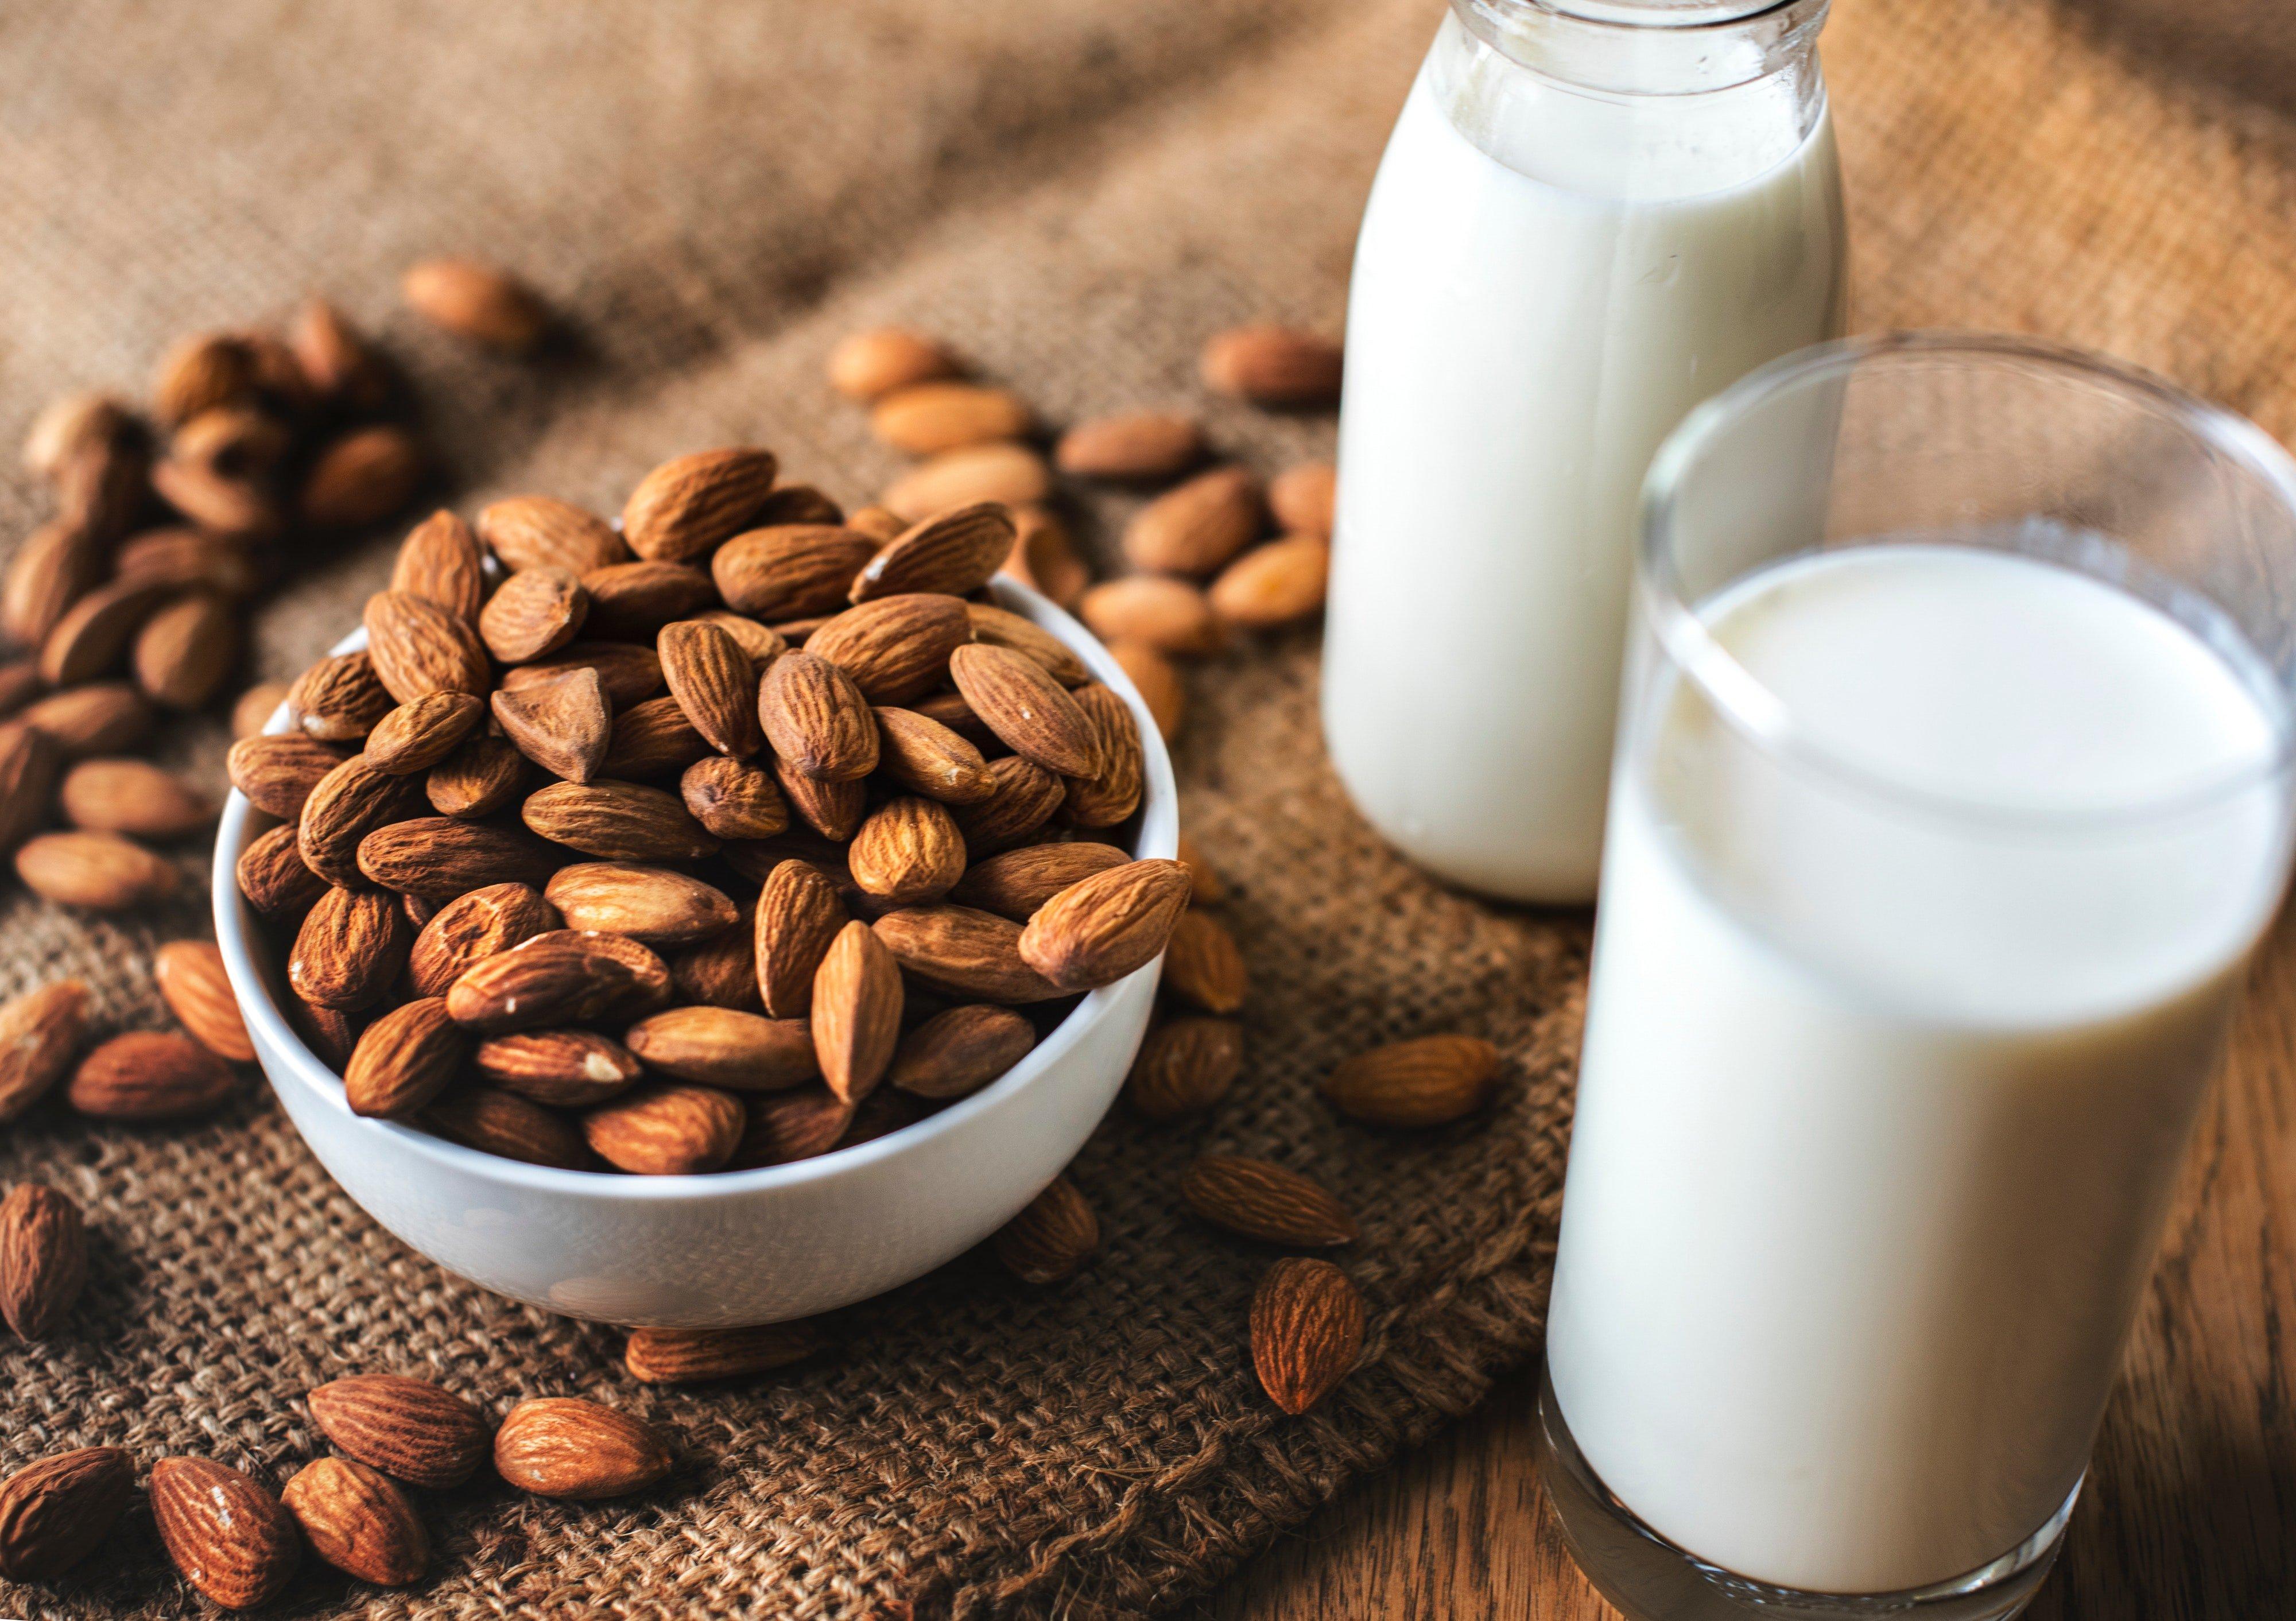 MIlk Healthy Foods to gain weight KreedOn